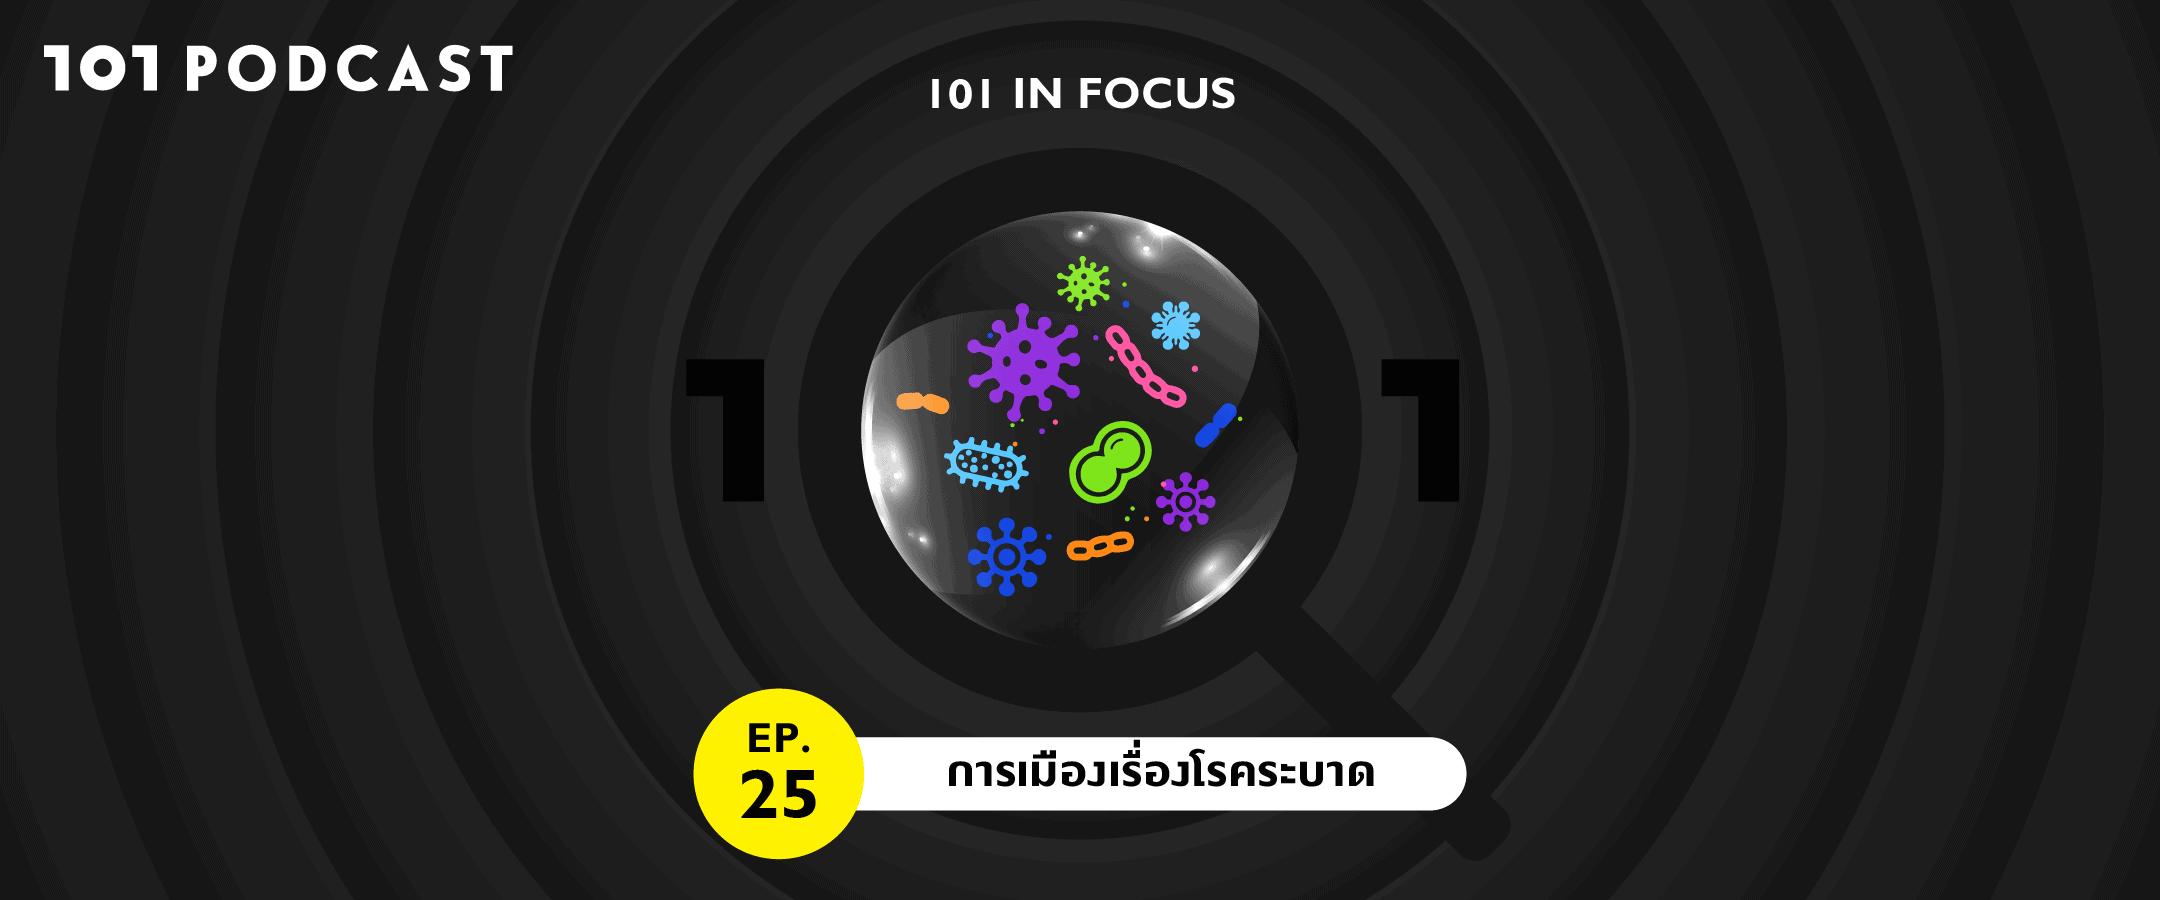 101 In Focus Ep.25 : การเมืองเรื่องโรคระบาด